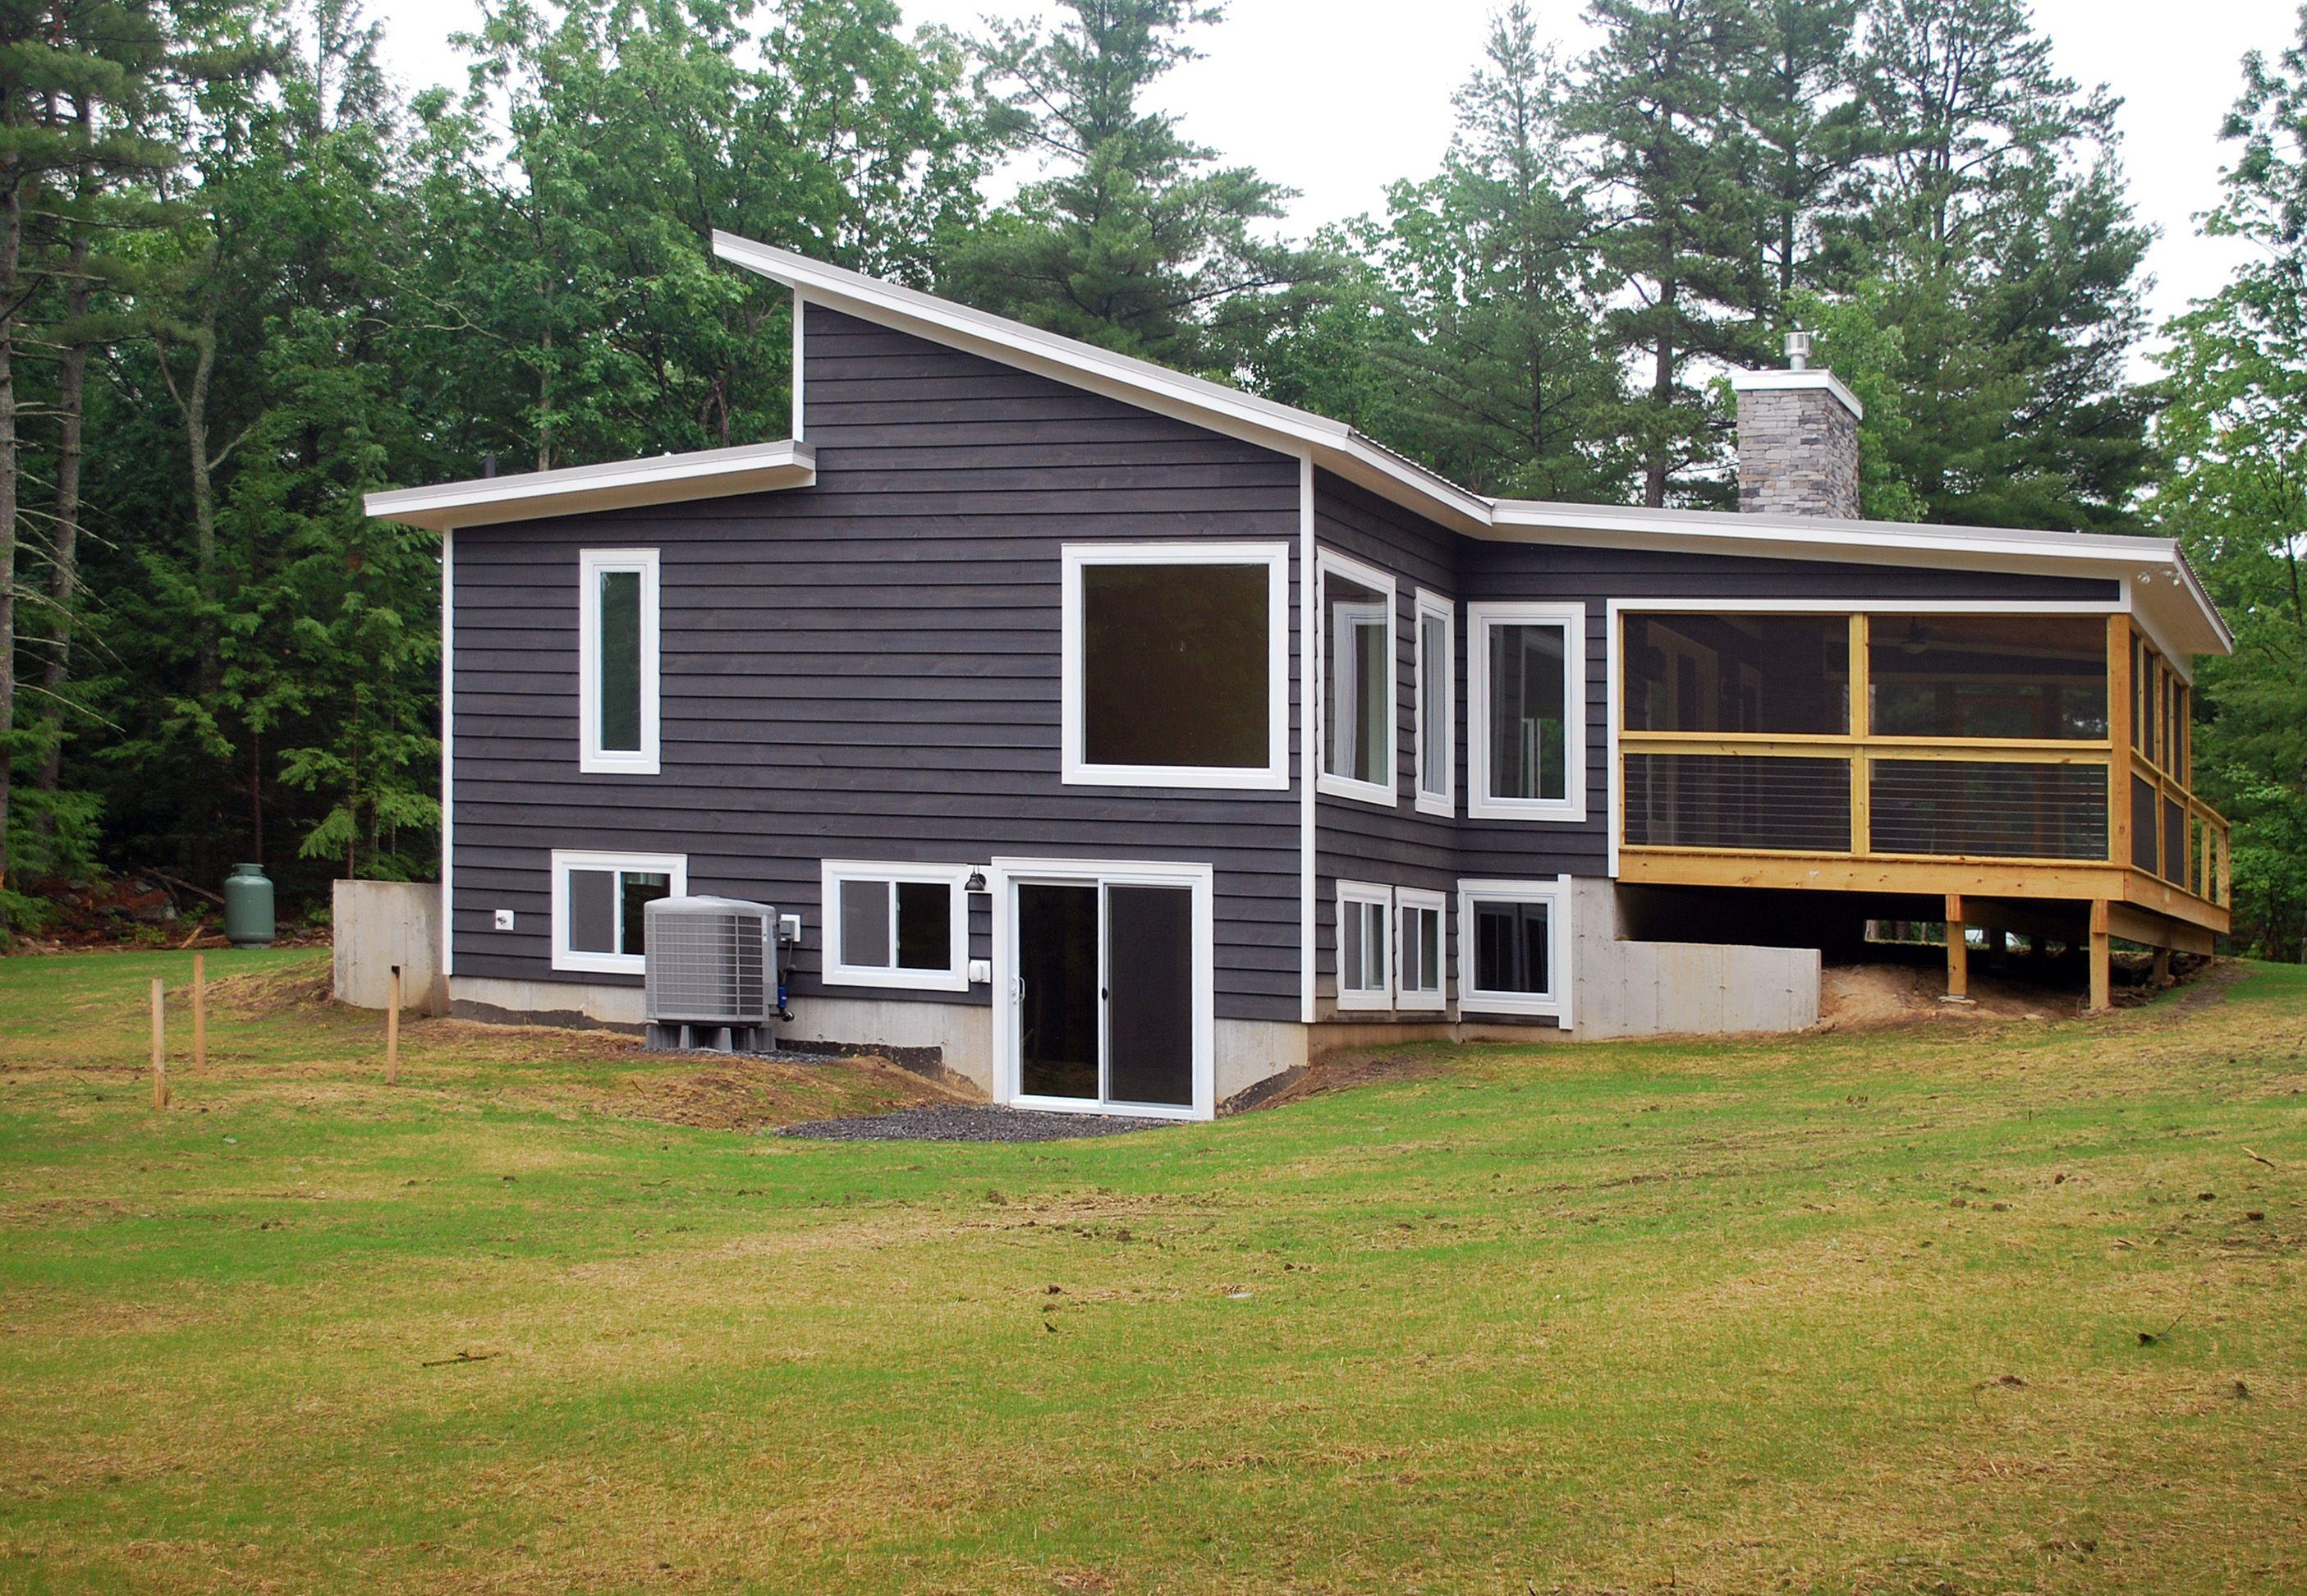 Slate Gray, Semi-Solid Stain #siding #Catskillfarms   Our ...